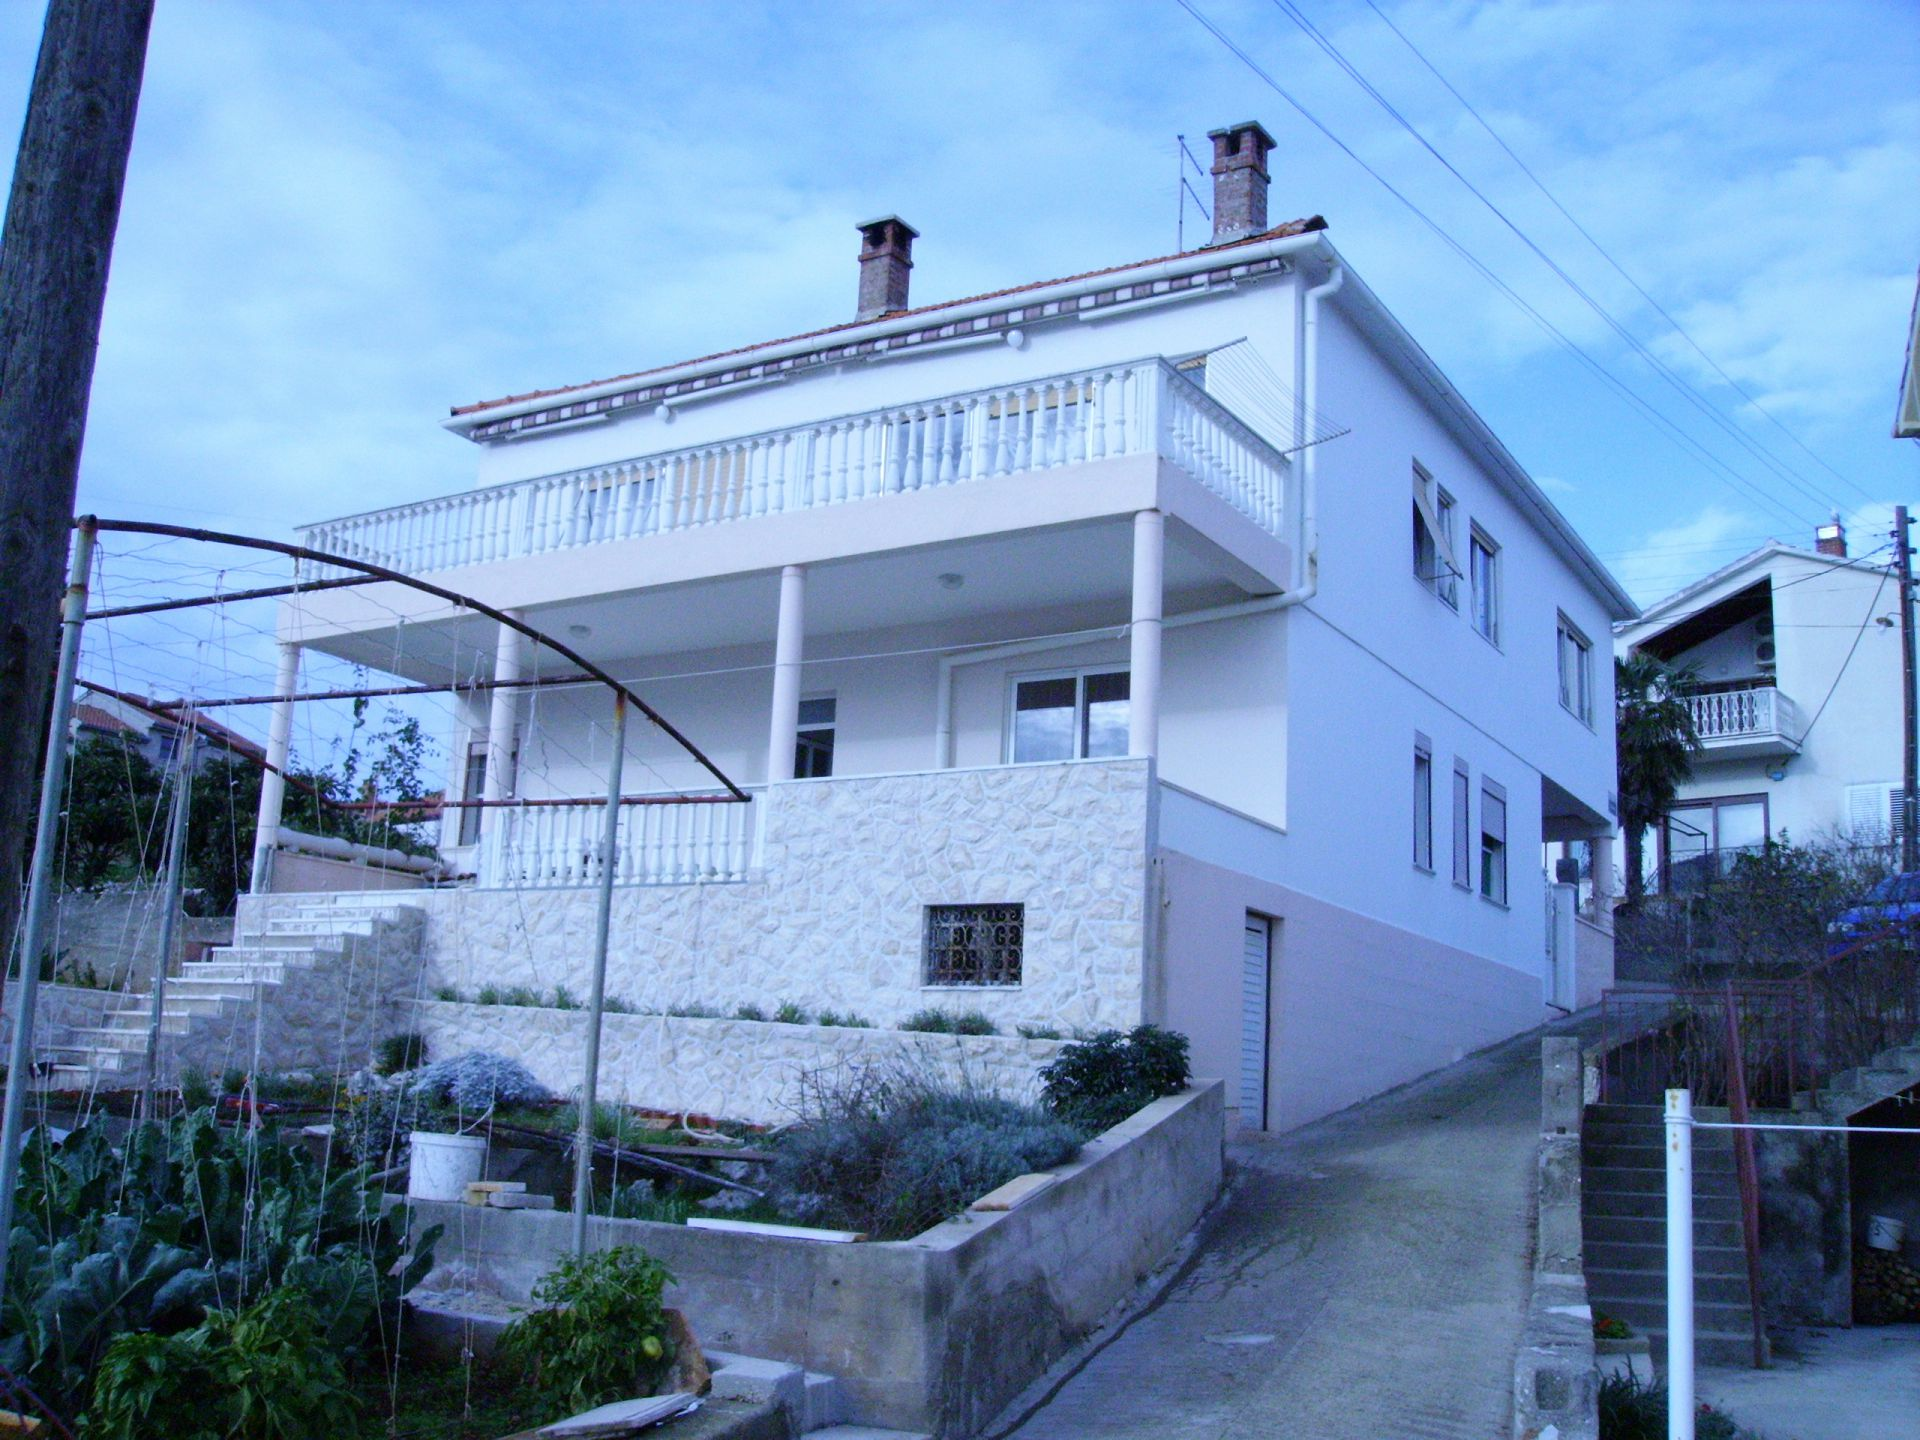 00719KALI - Кали - Апартаменты Хорватия